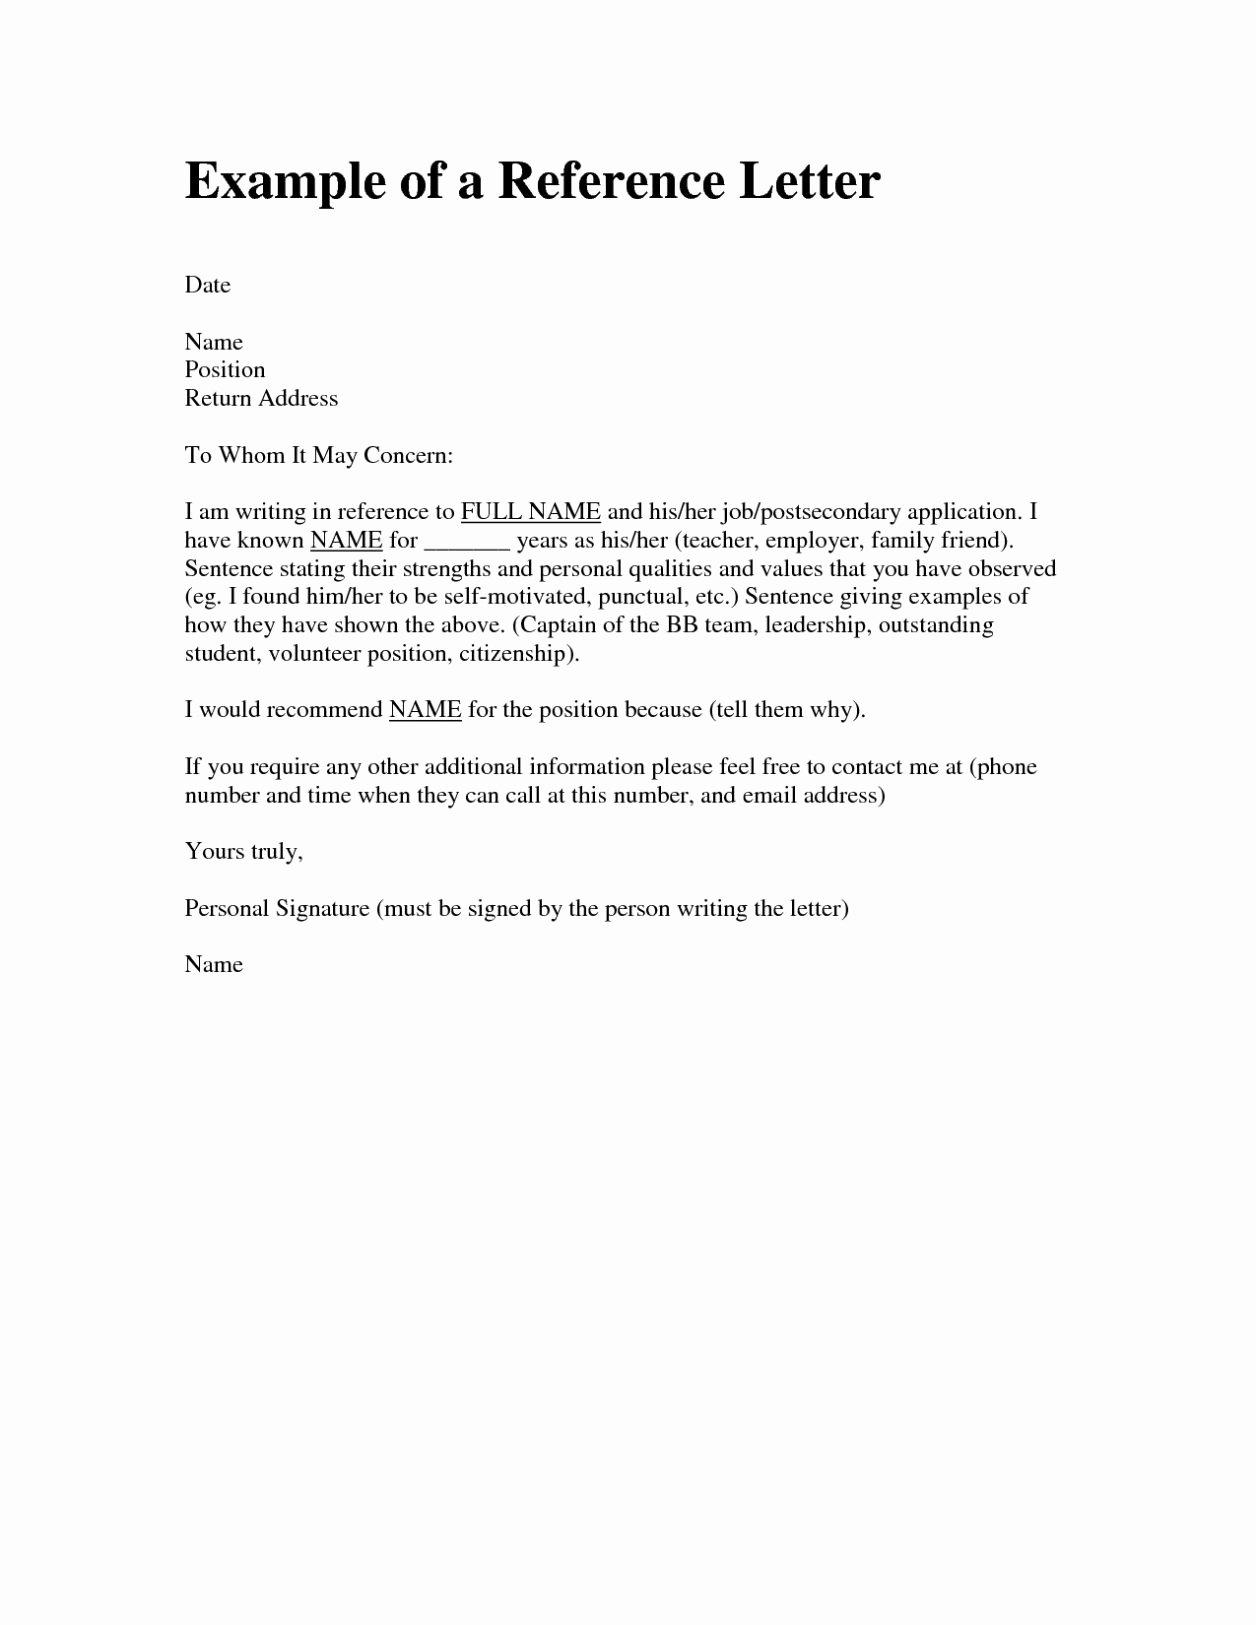 Letter Of Re Mendation format Sample Template